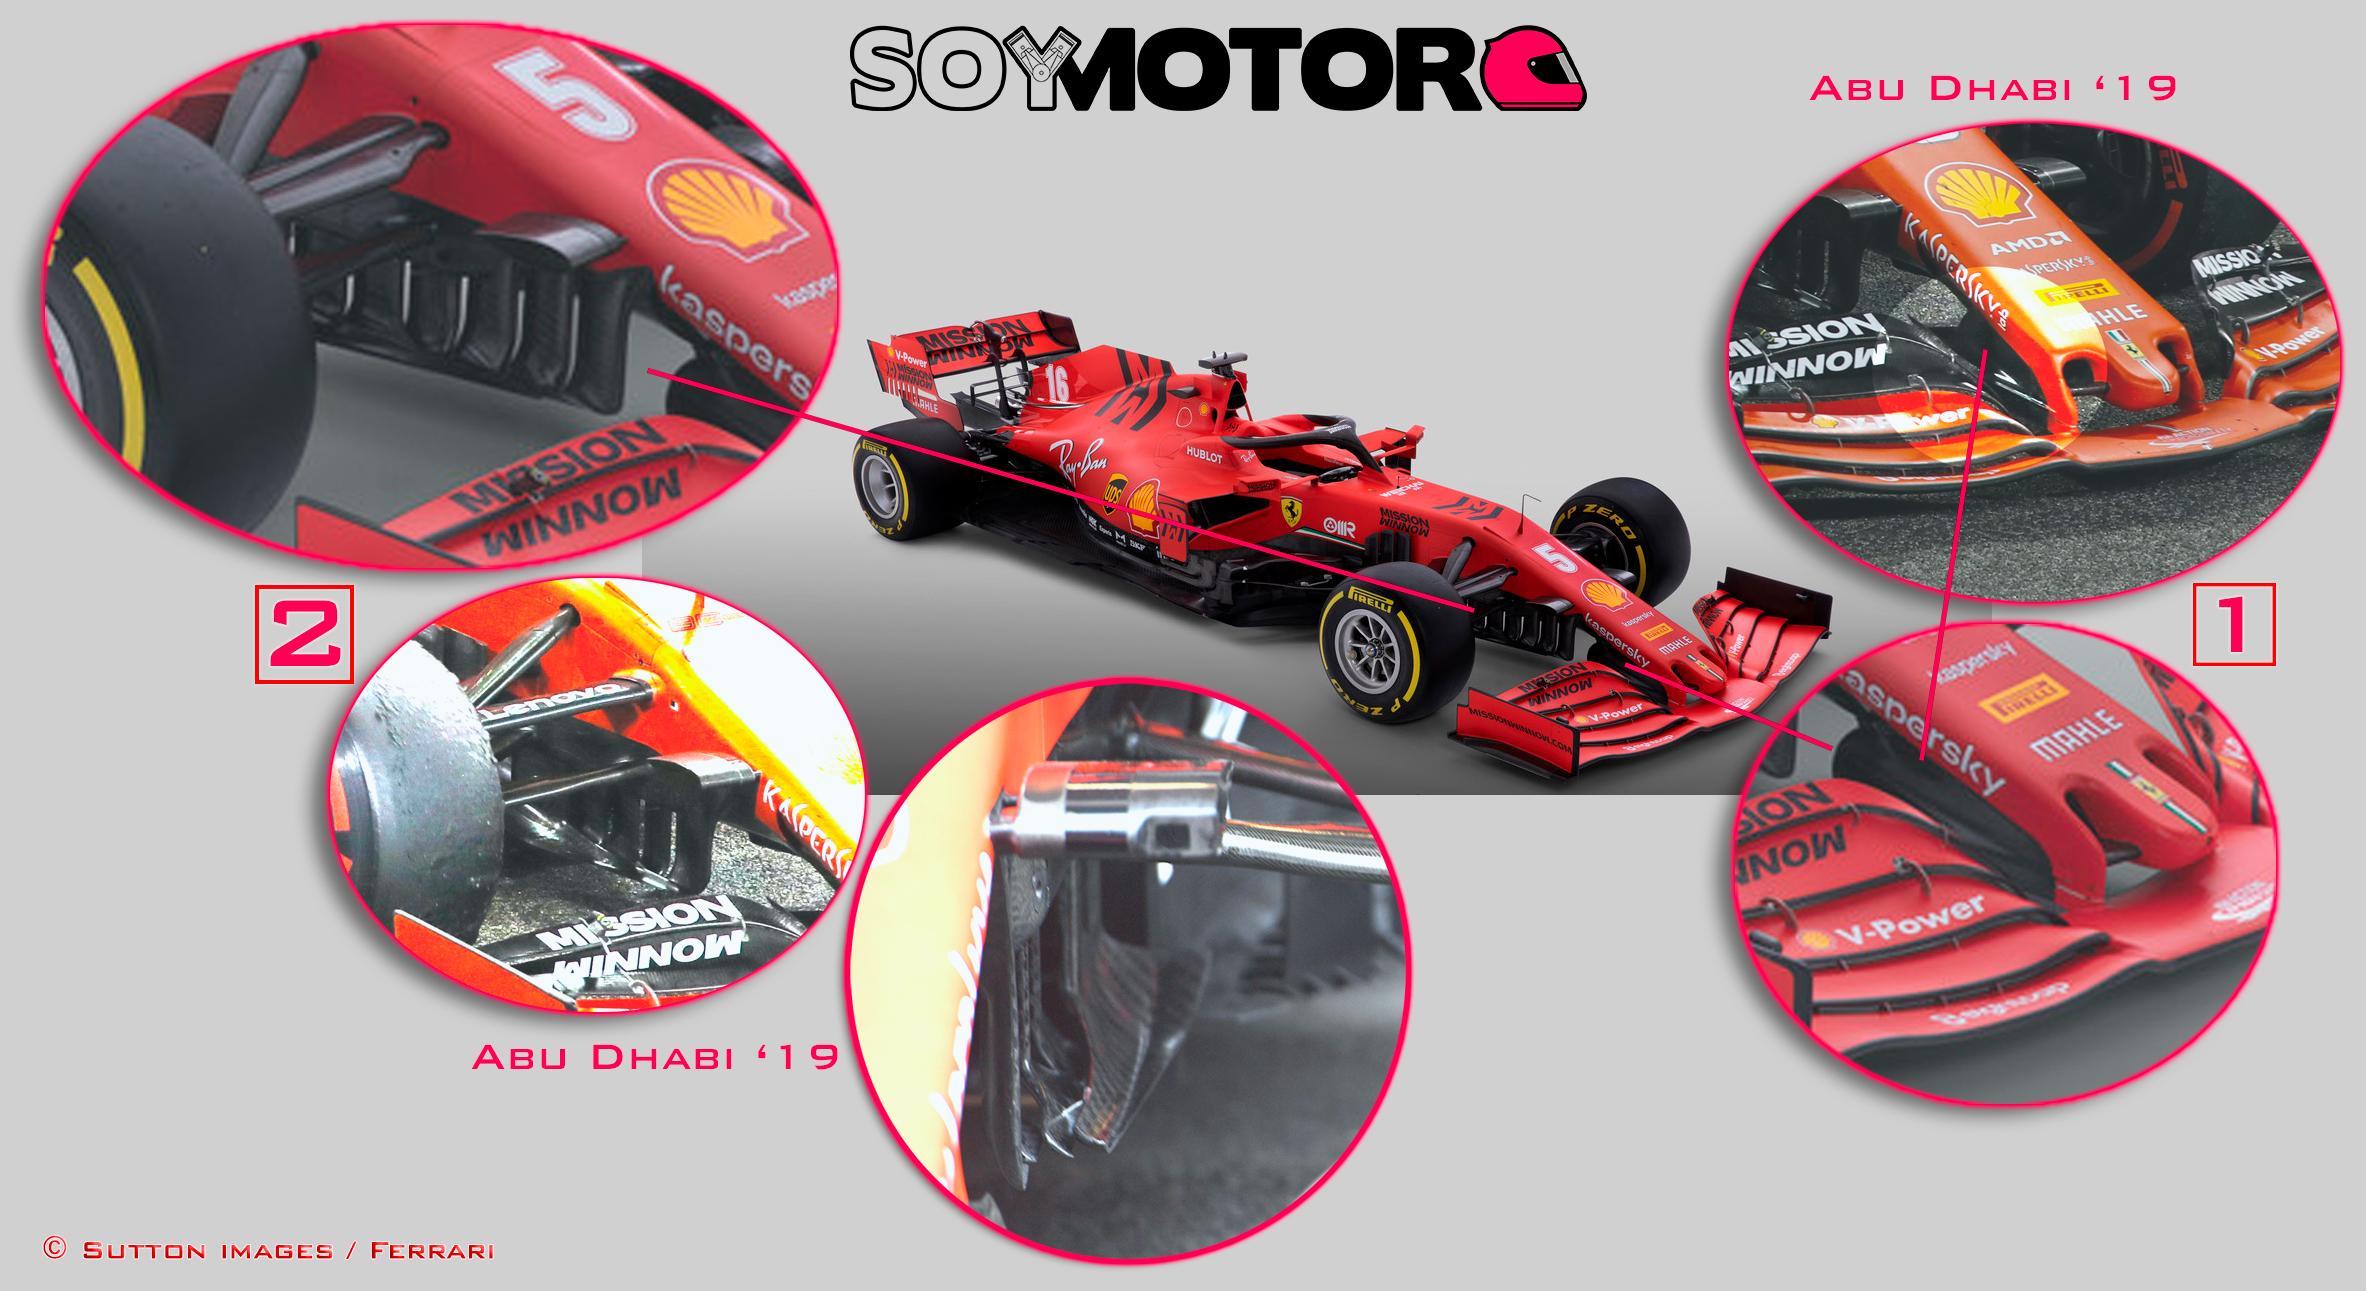 ferrari-sf1000-turning-vanes-y-soporte-ala-delantera-soymotor.jpg